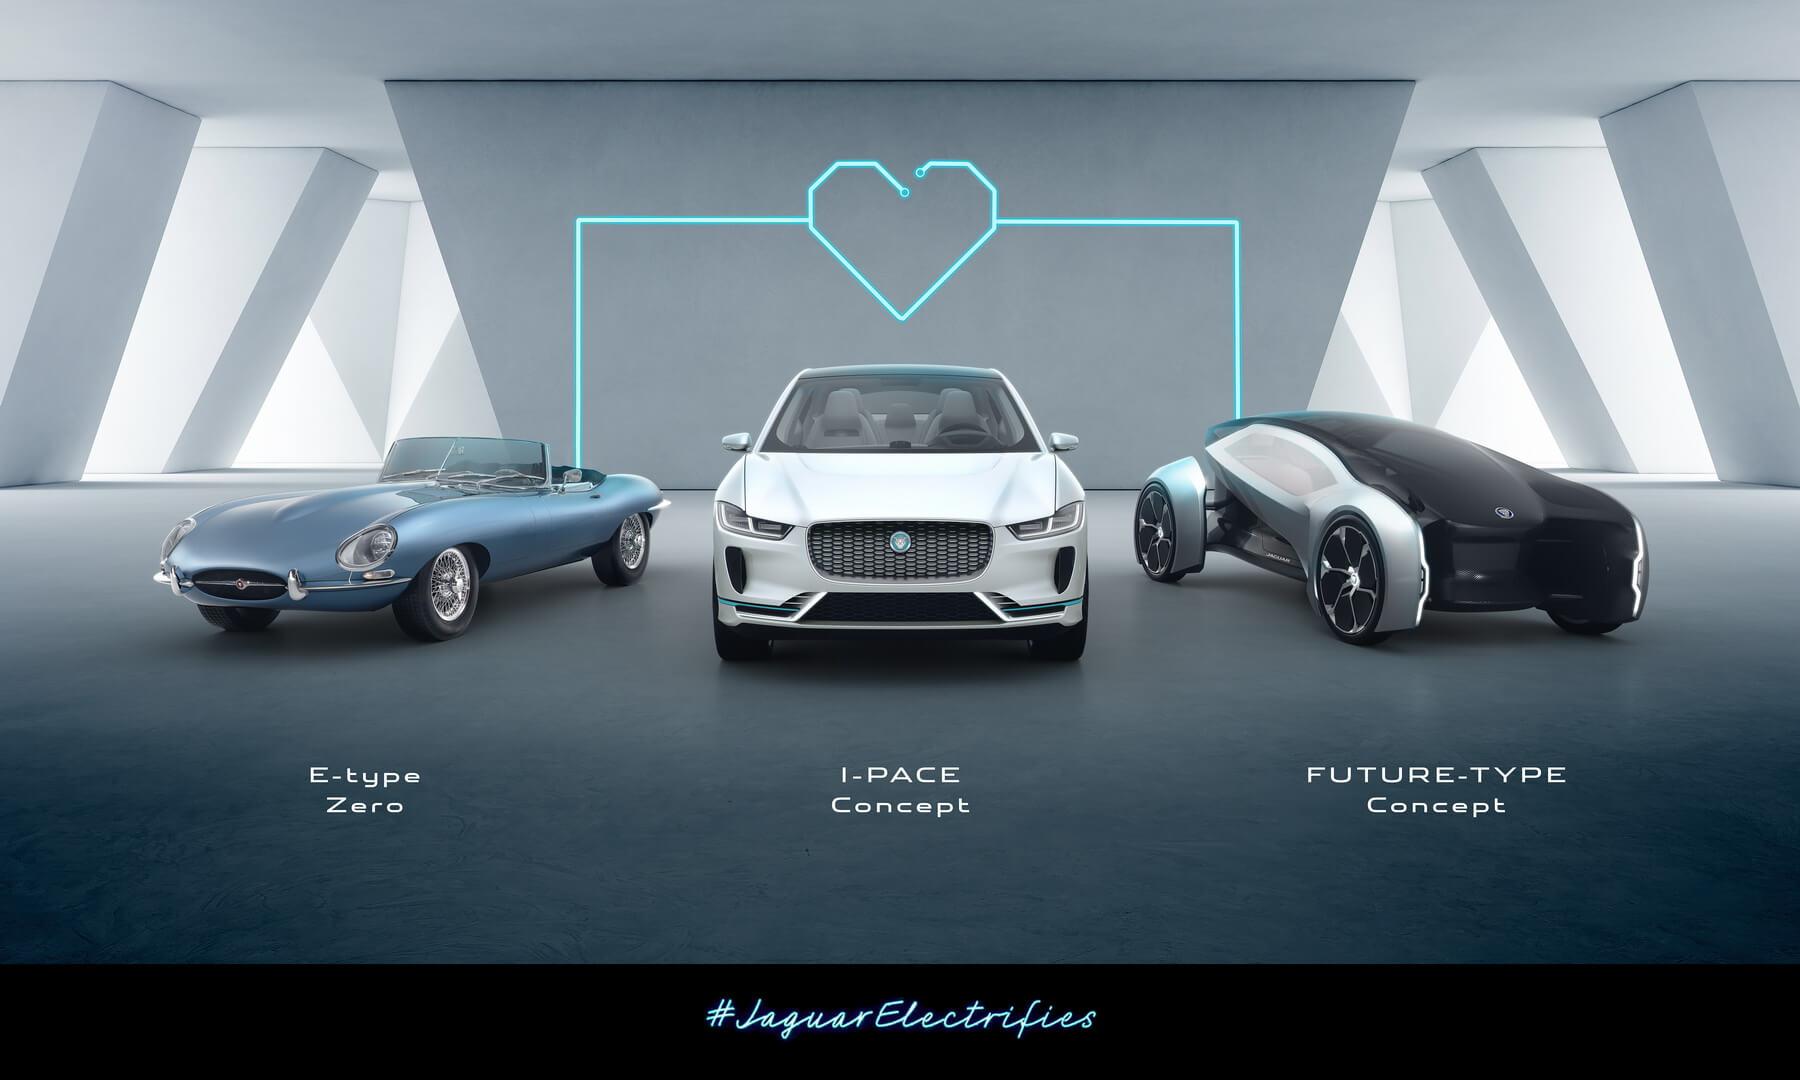 Jaguar E-type Zero, I-Pace, Future-Type Concept